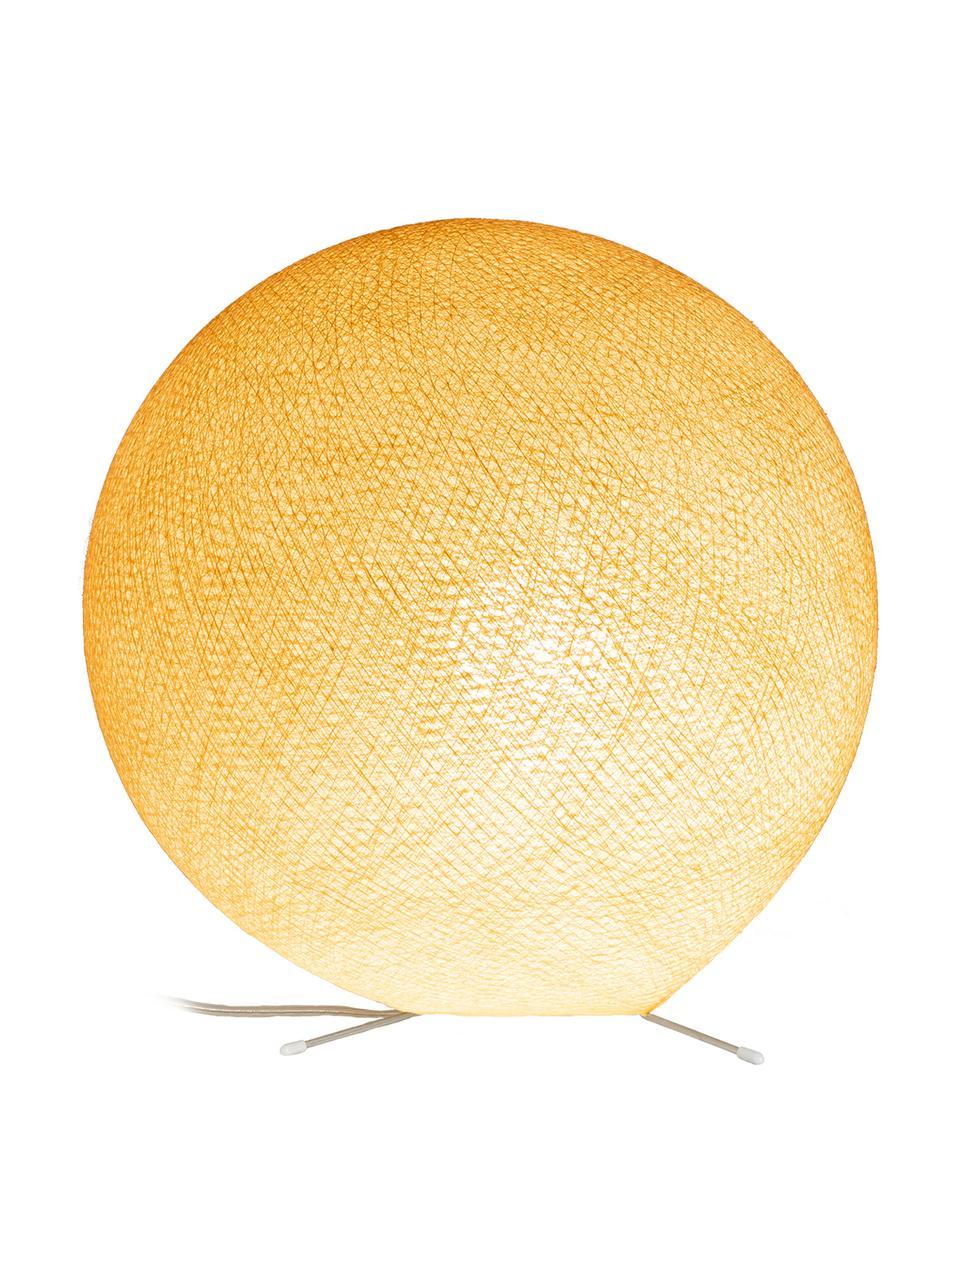 DIY Tischlampe Colorain, Lampenschirm: Polyester, Lampenfuß: Metall, Beige, Ø 36 cm